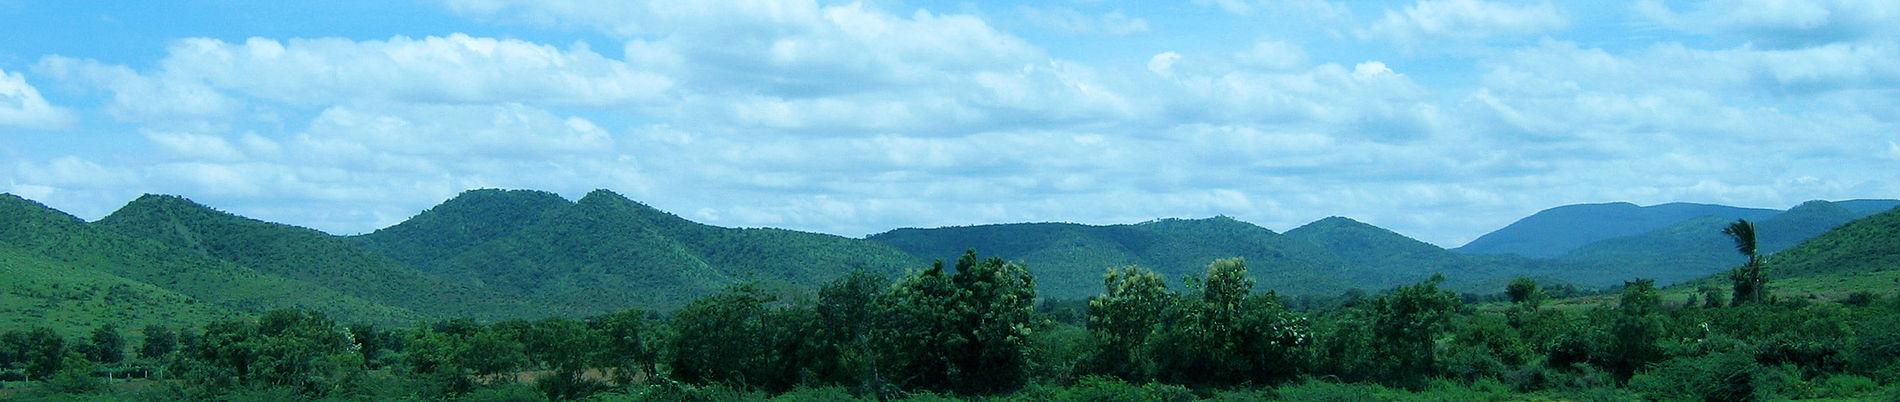 Endemic and endangered plant species of tirumala hills